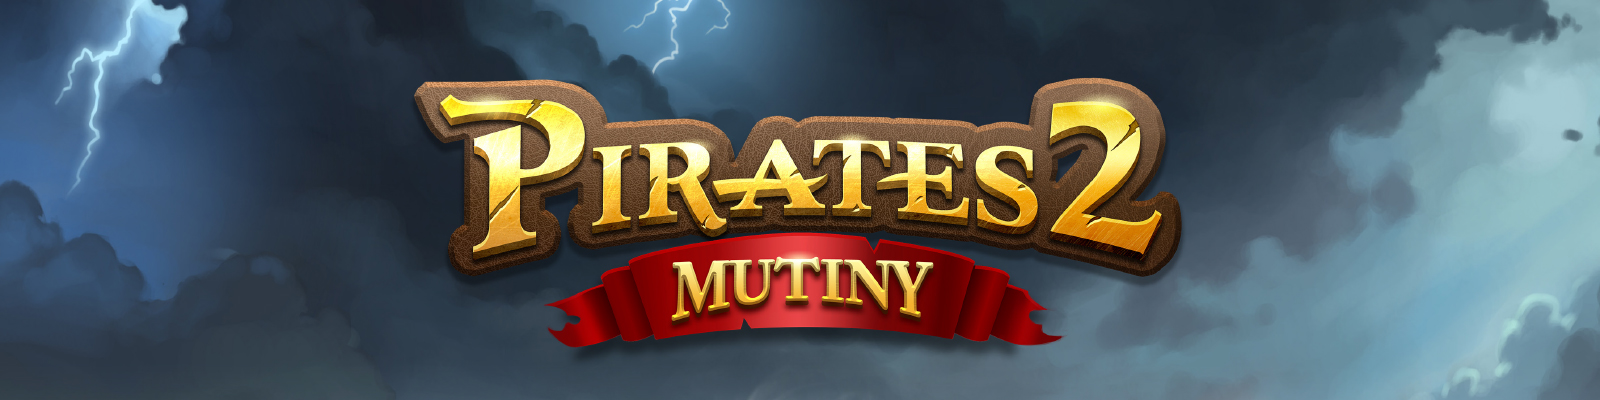 Pirates 2: Mutiny from Yggdrasil